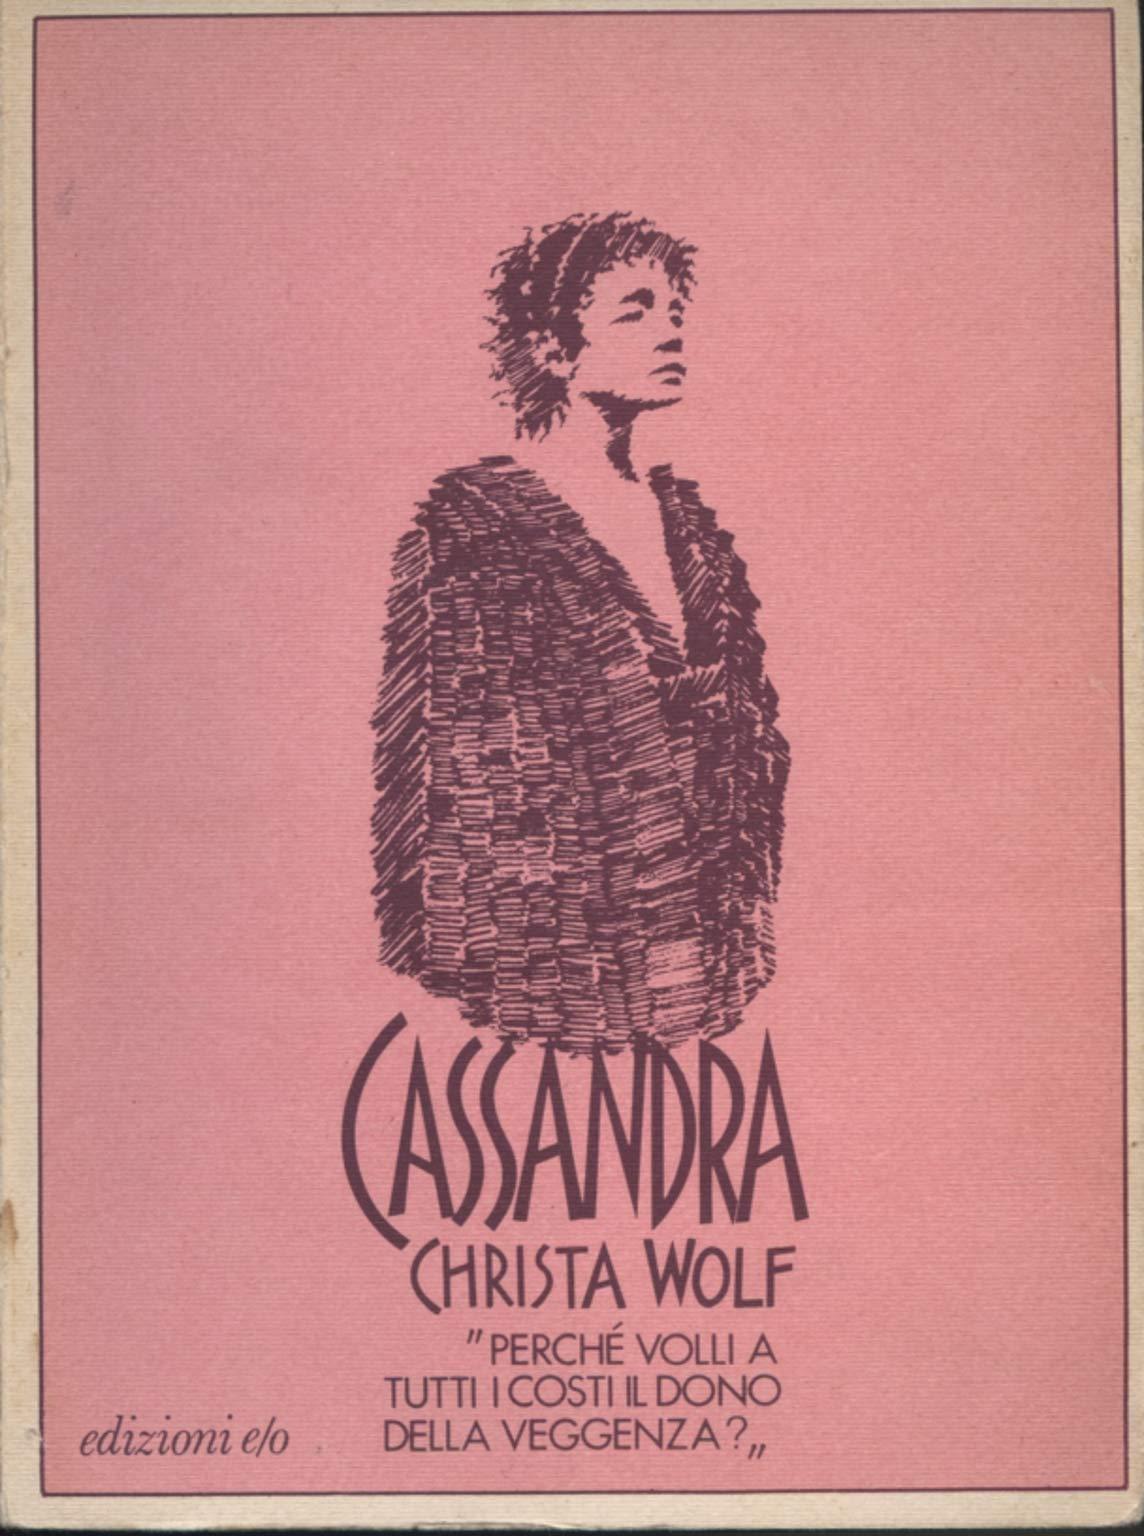 cassandra-dal-mondo